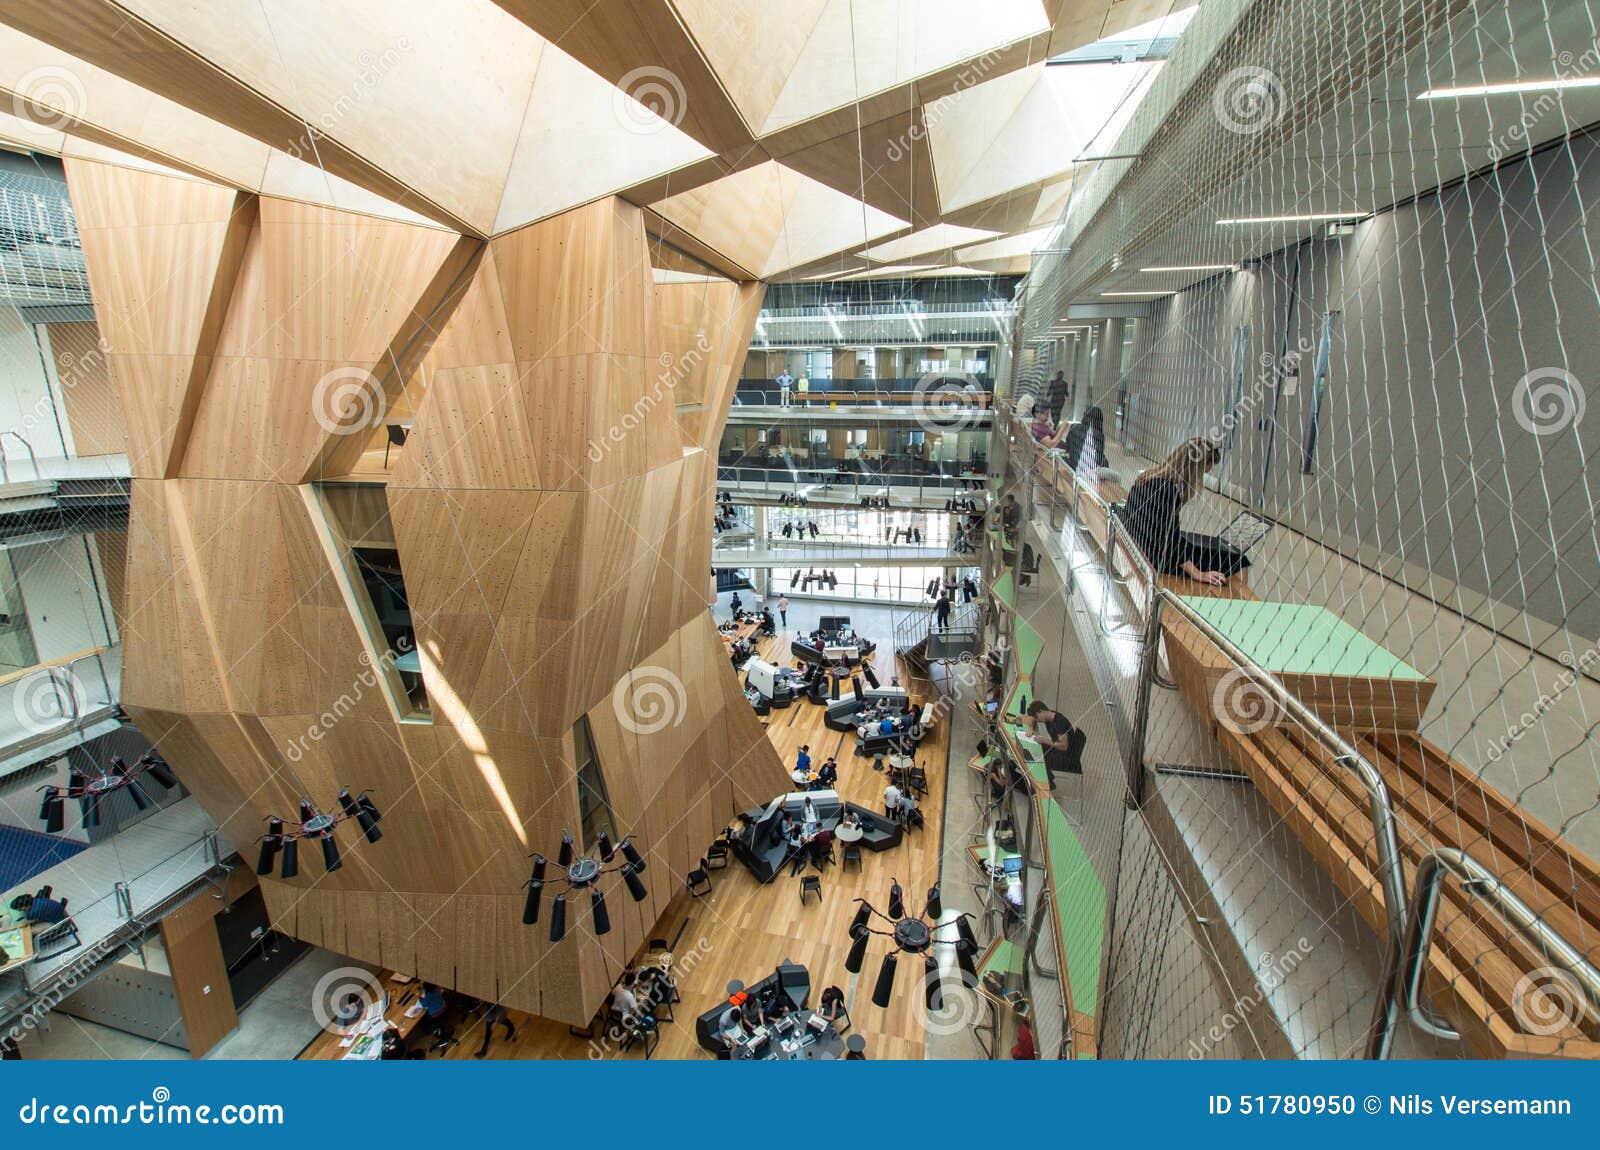 Melbourne school of design at the university of melbourne for Design industry melbourne